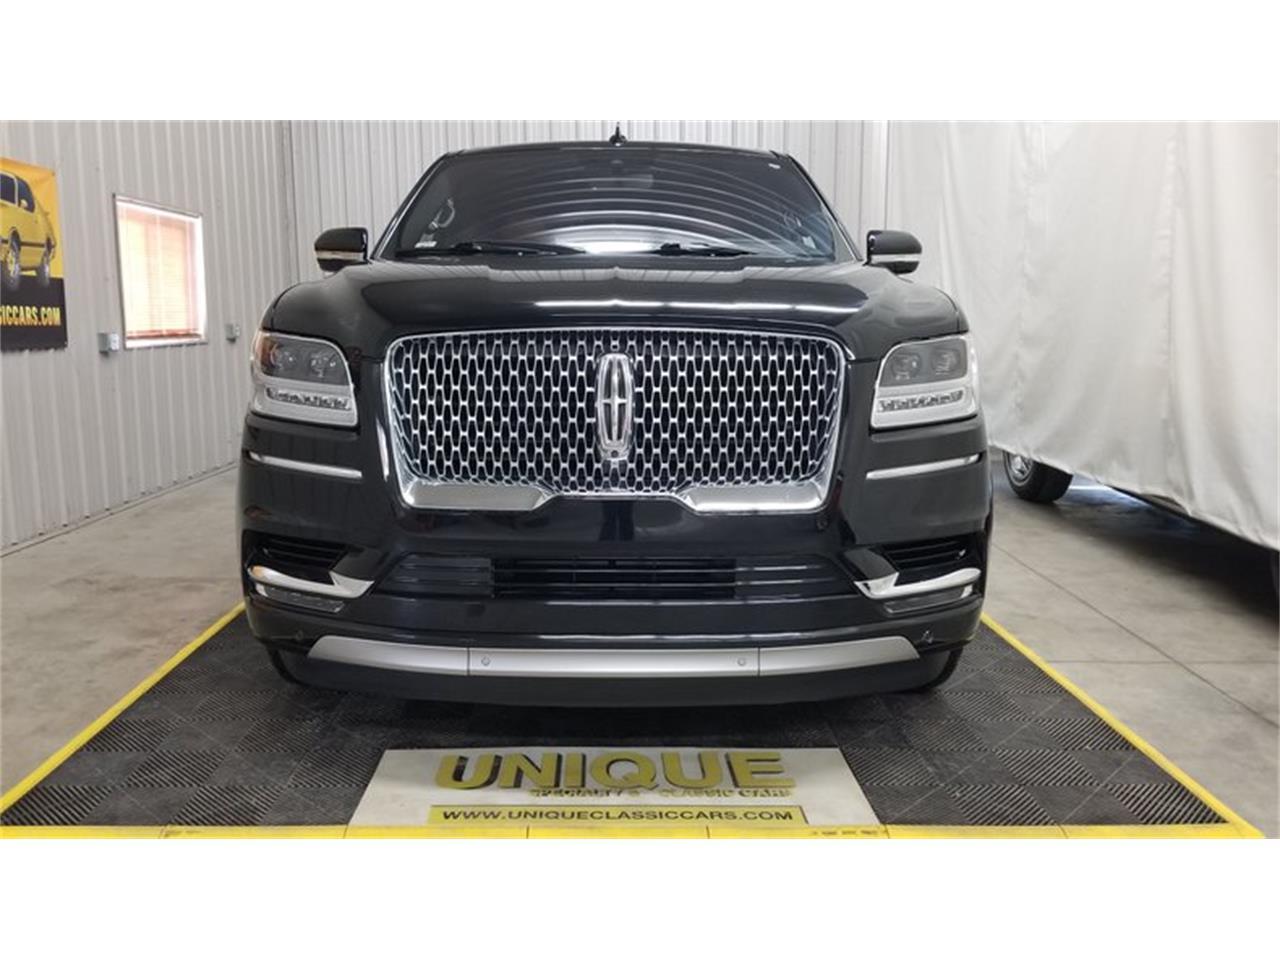 2018 Lincoln Navigator (CC-1272194) for sale in Mankato, Minnesota